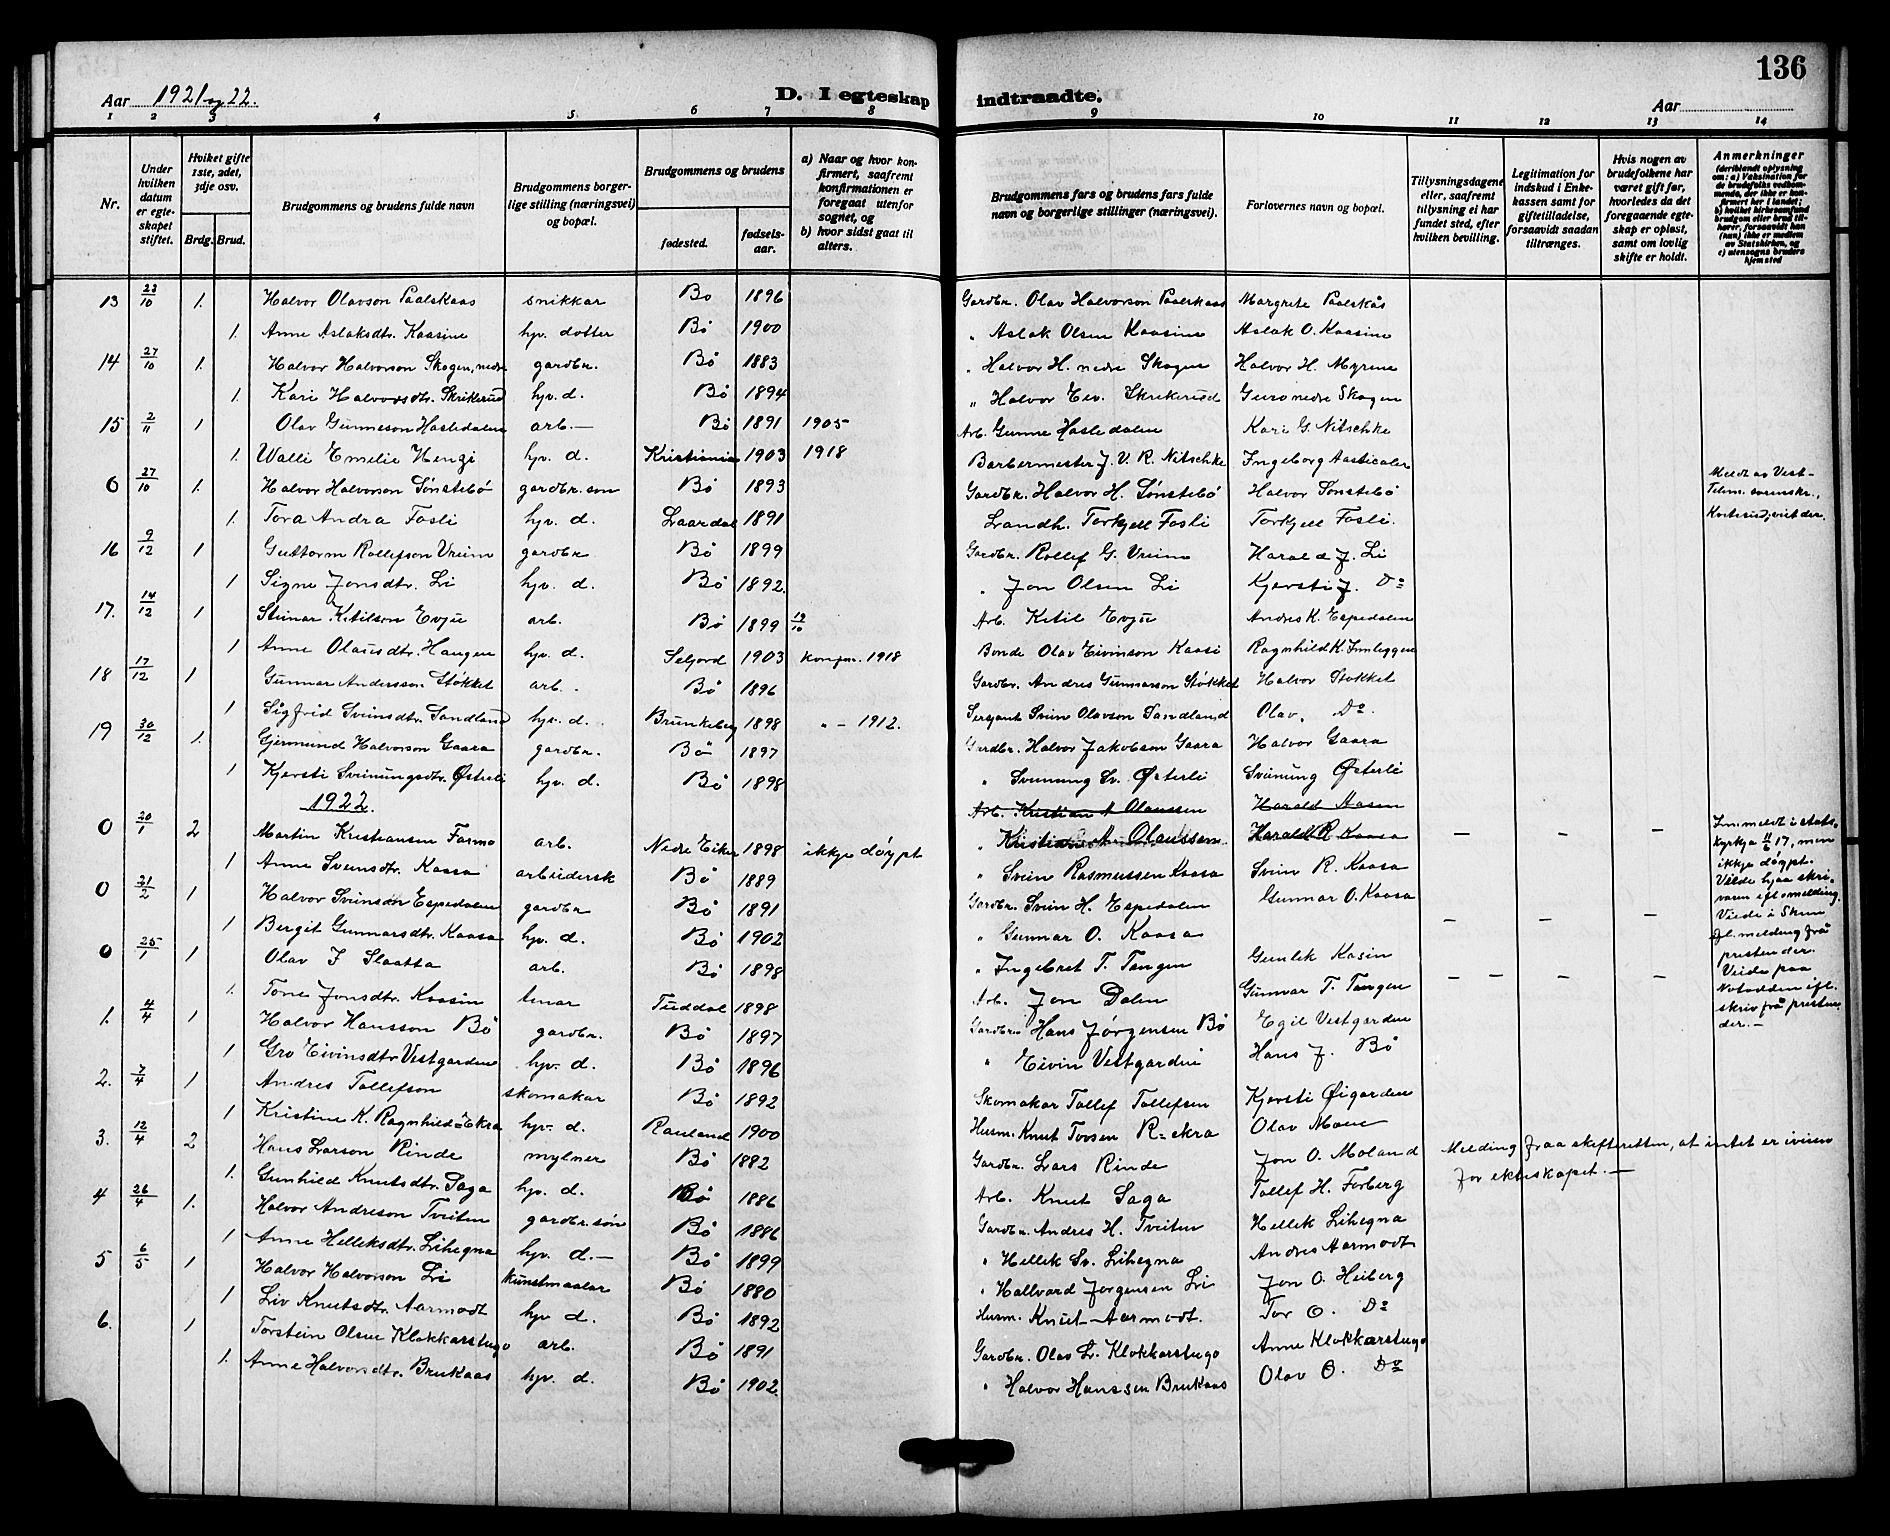 SAKO, Bø kirkebøker, G/Ga/L0007: Klokkerbok nr. 7, 1909-1924, s. 136